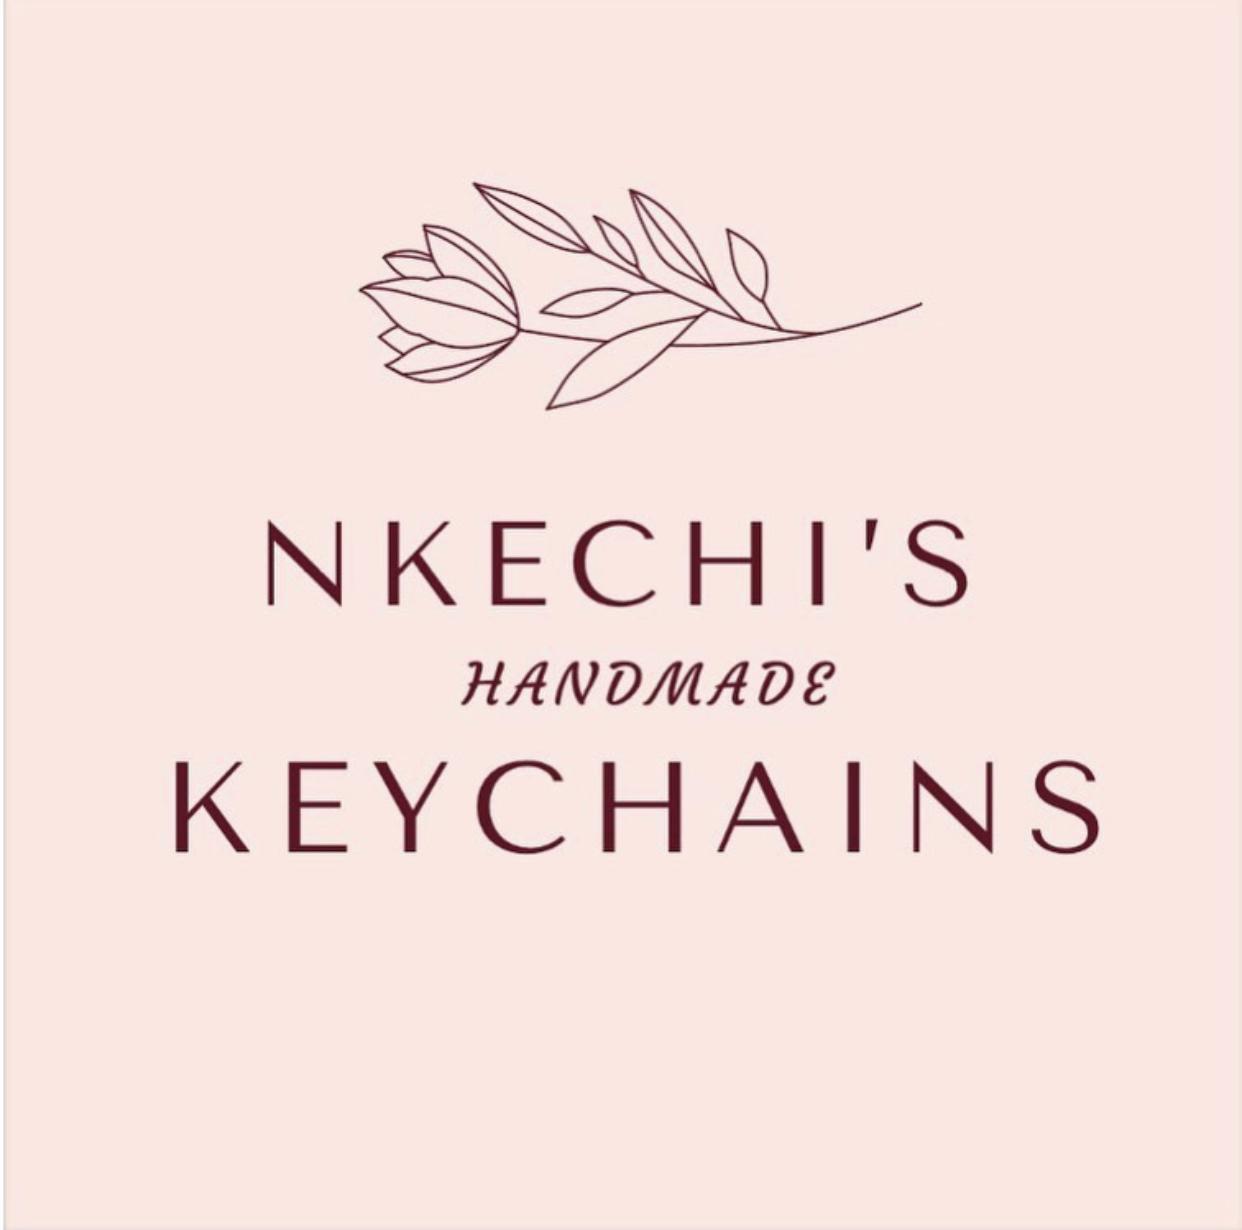 Student Entrepreneur: Introducing Coi Okaroh & Nkechi